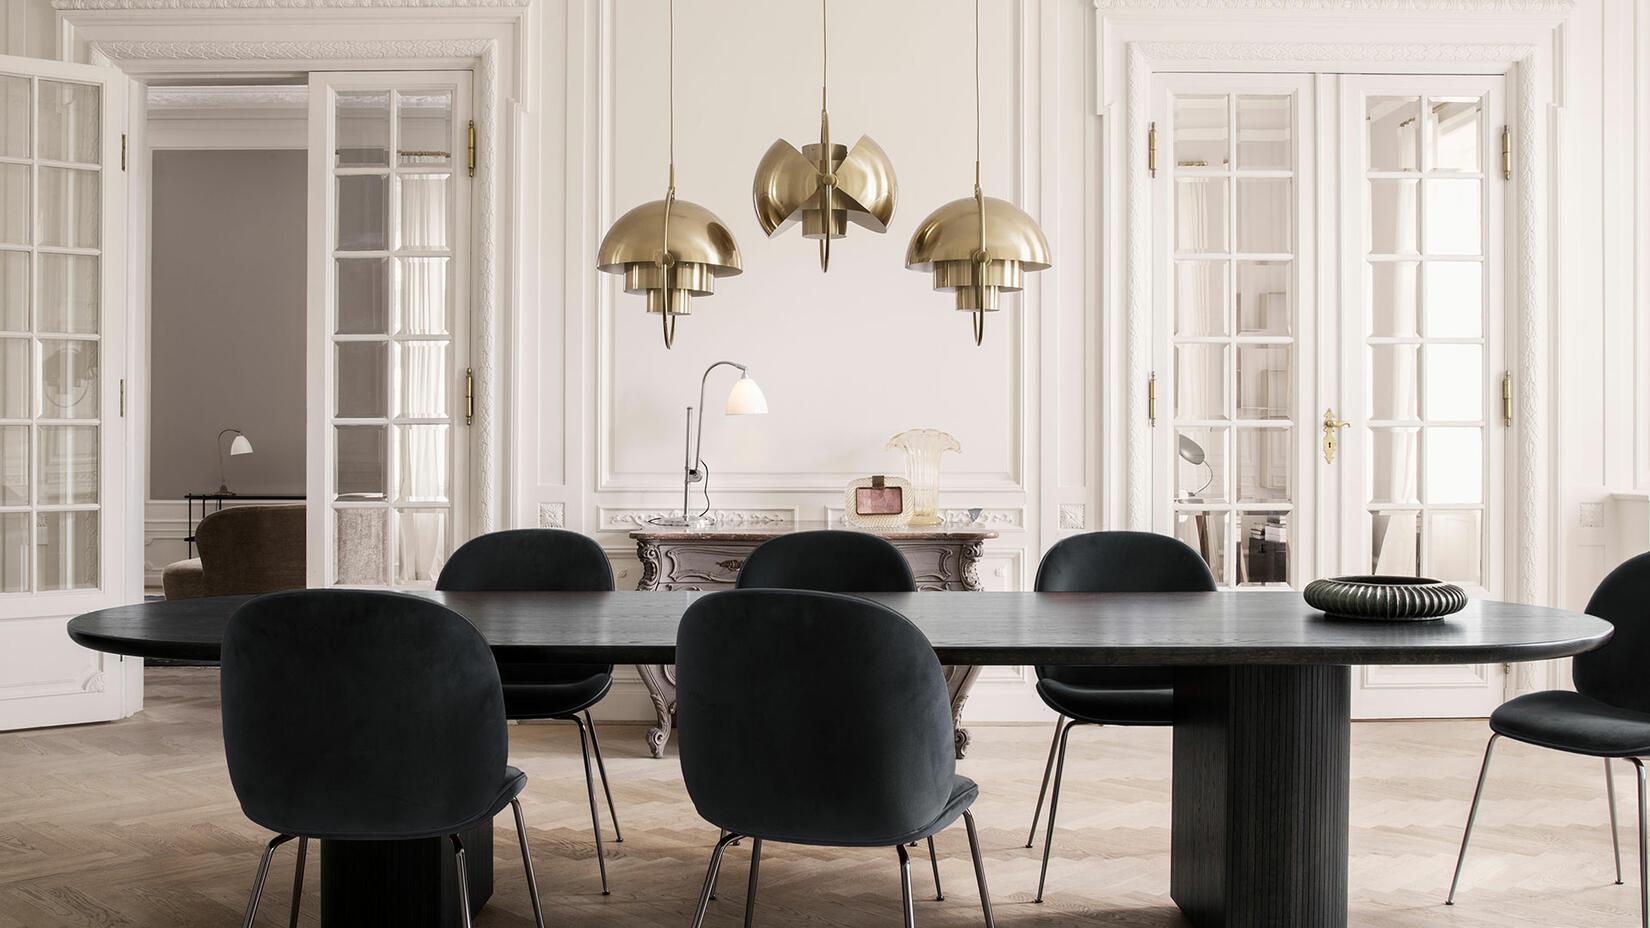 gubi stol Gubi | Lampor och möbler online | Olsson & Gerthel gubi stol